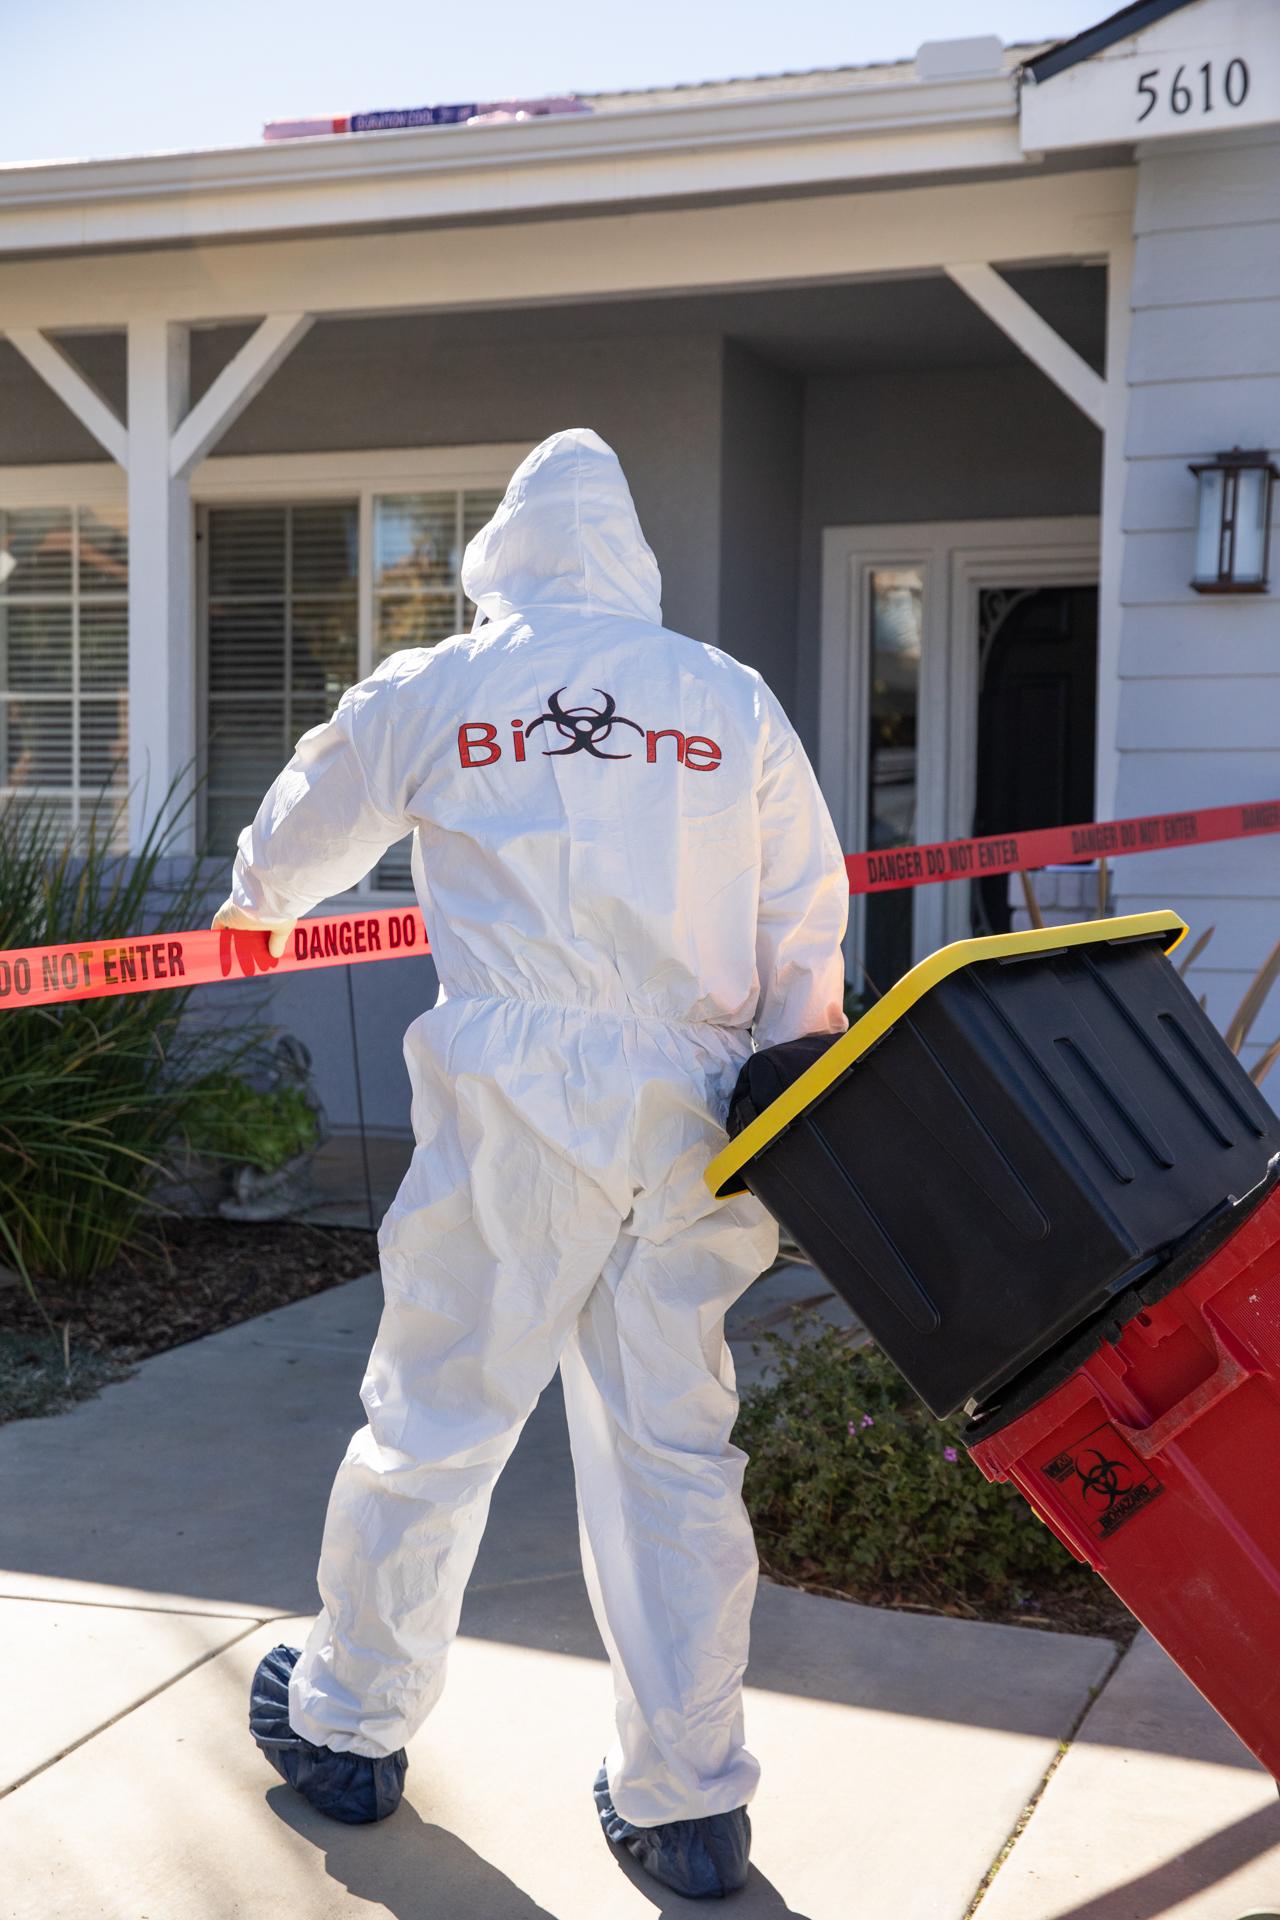 Bio-One technician arriving on-scene, fully dressed in PPE.